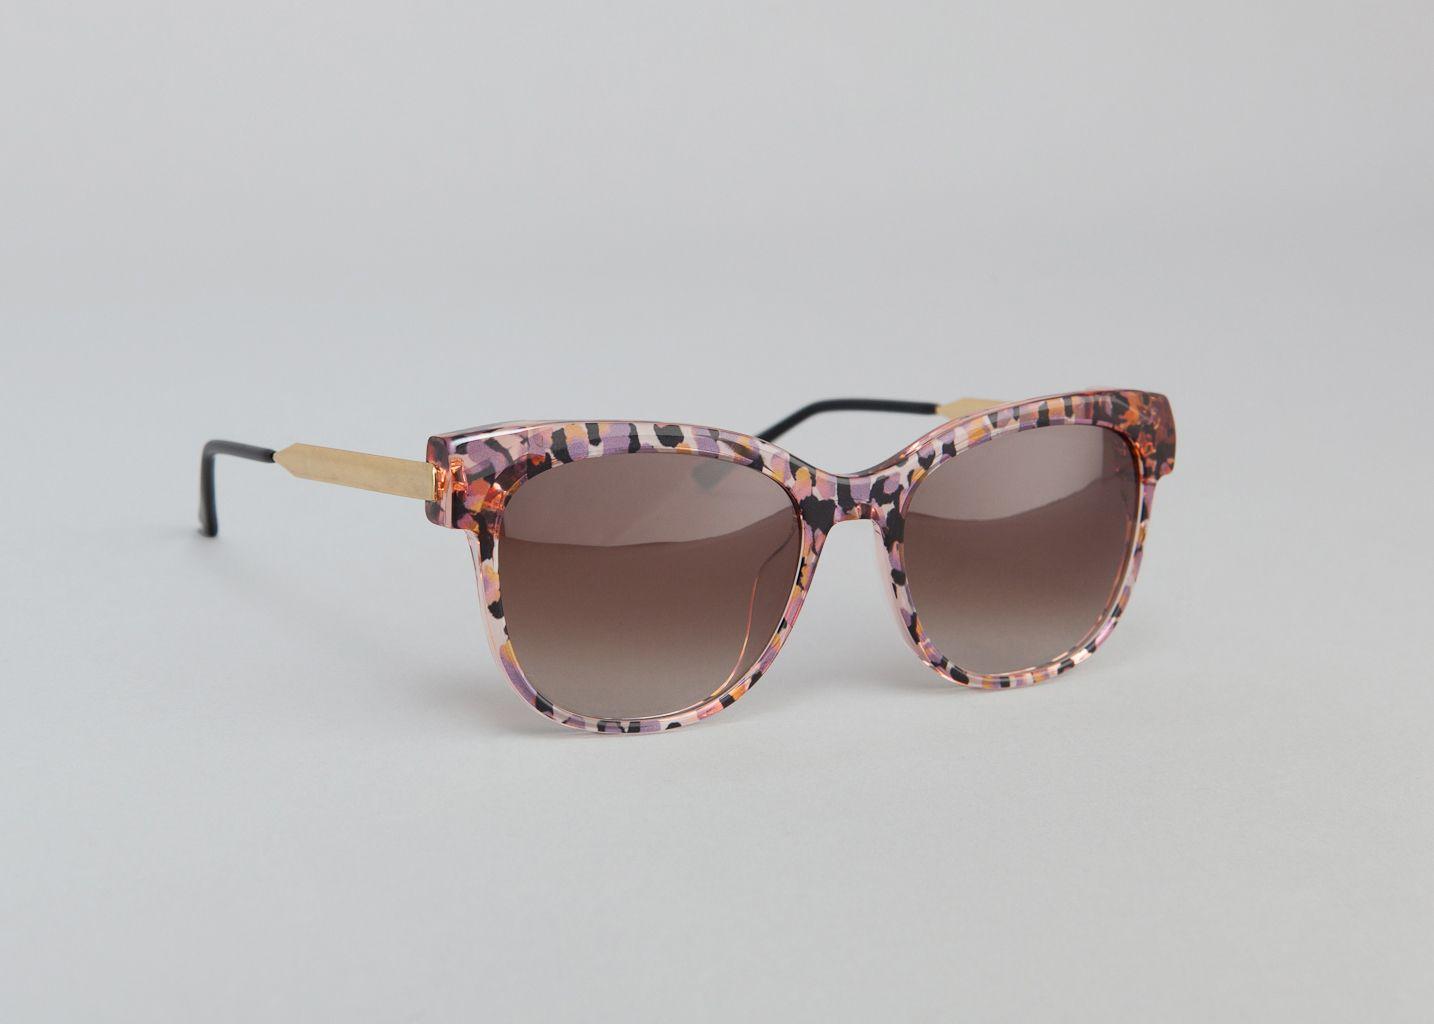 lunettes lippy thierry lasry multicolore l 39 exception. Black Bedroom Furniture Sets. Home Design Ideas